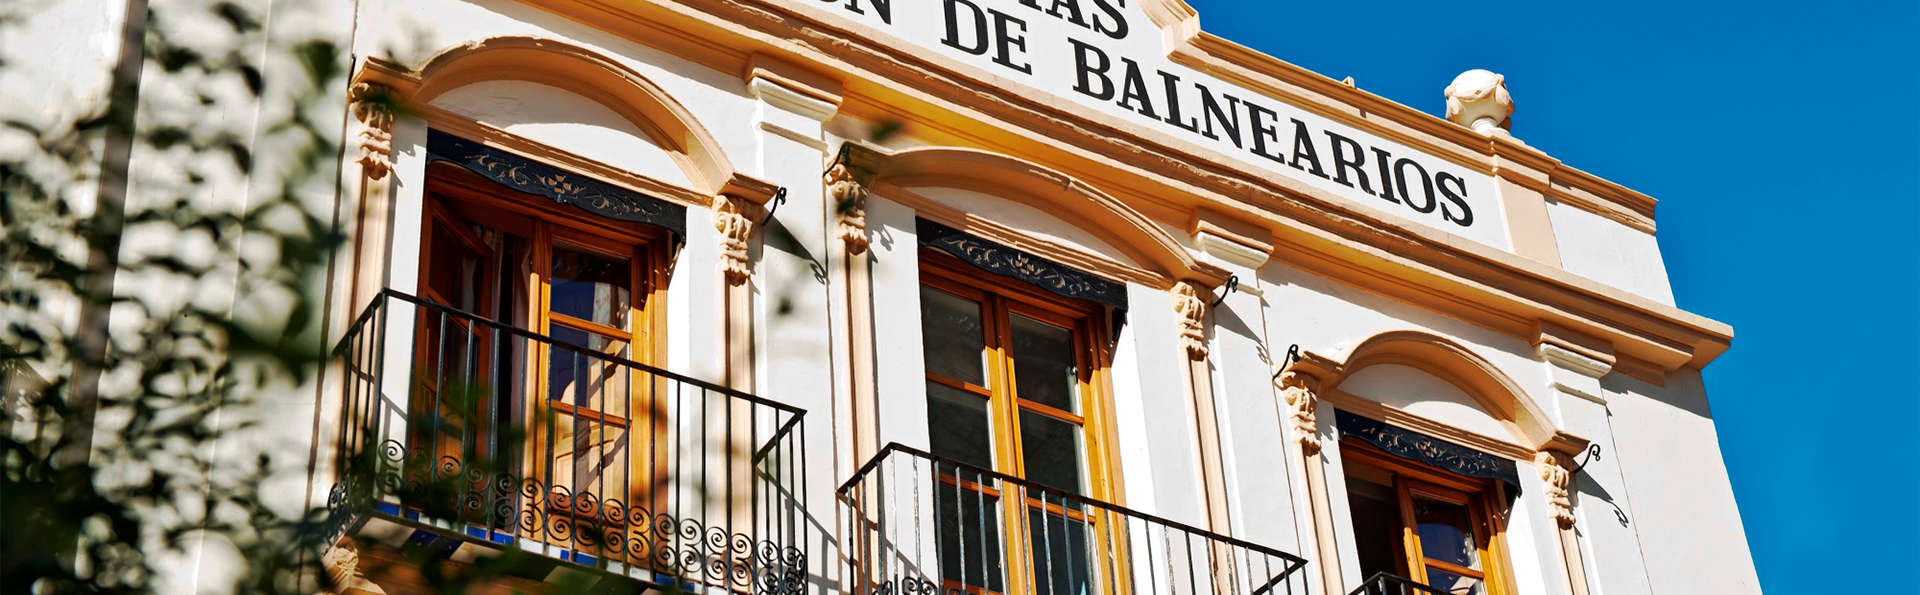 Balneario de Villavieja - EDIT_Facade.jpg